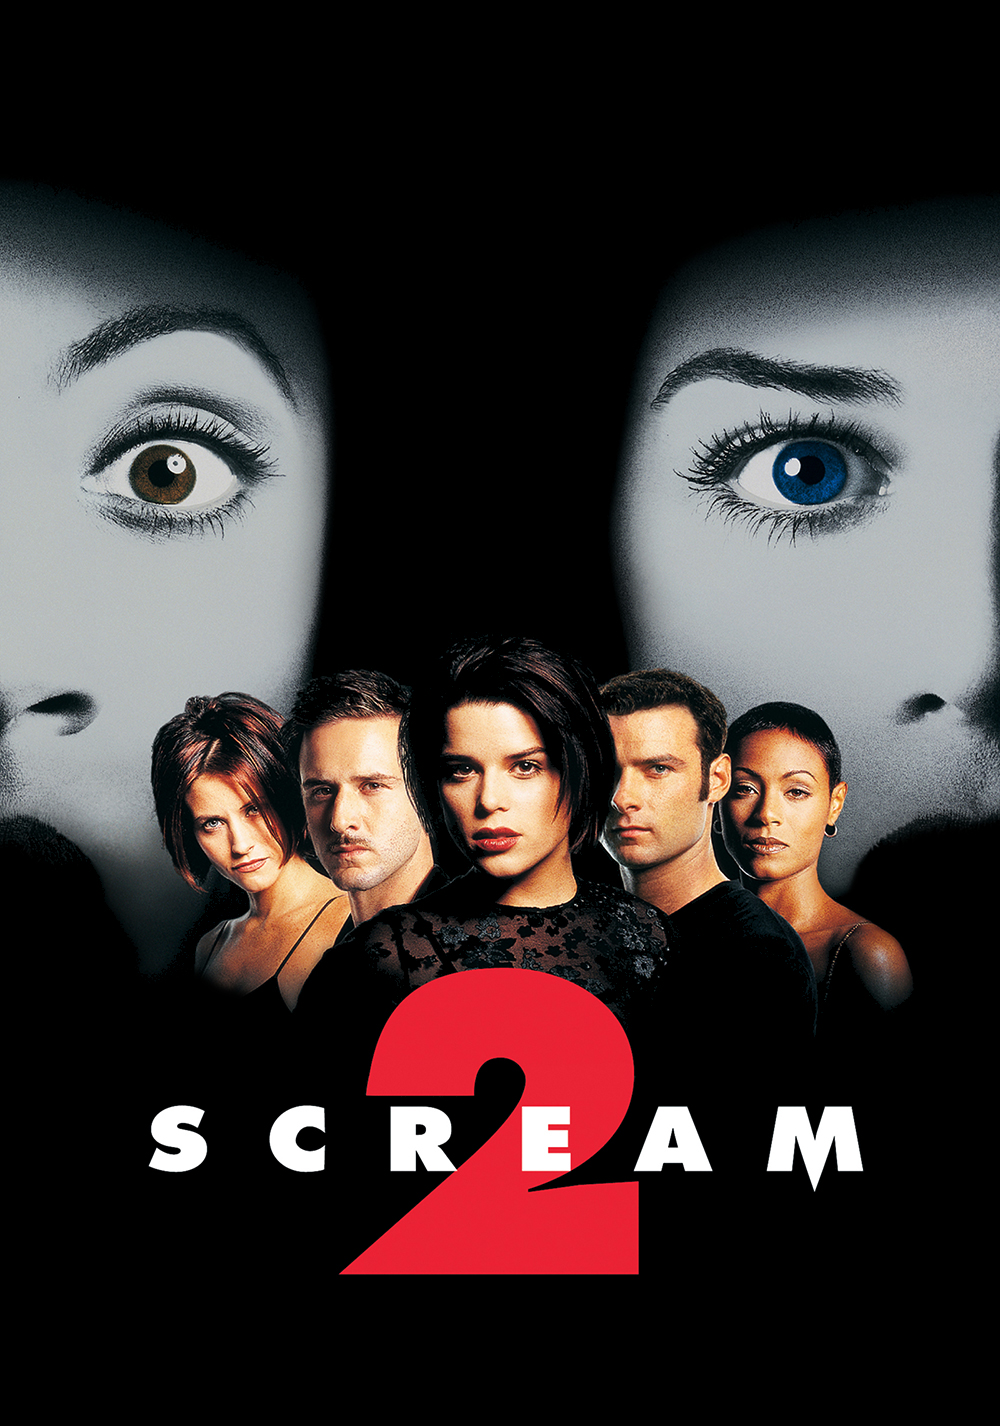 scream - photo #48